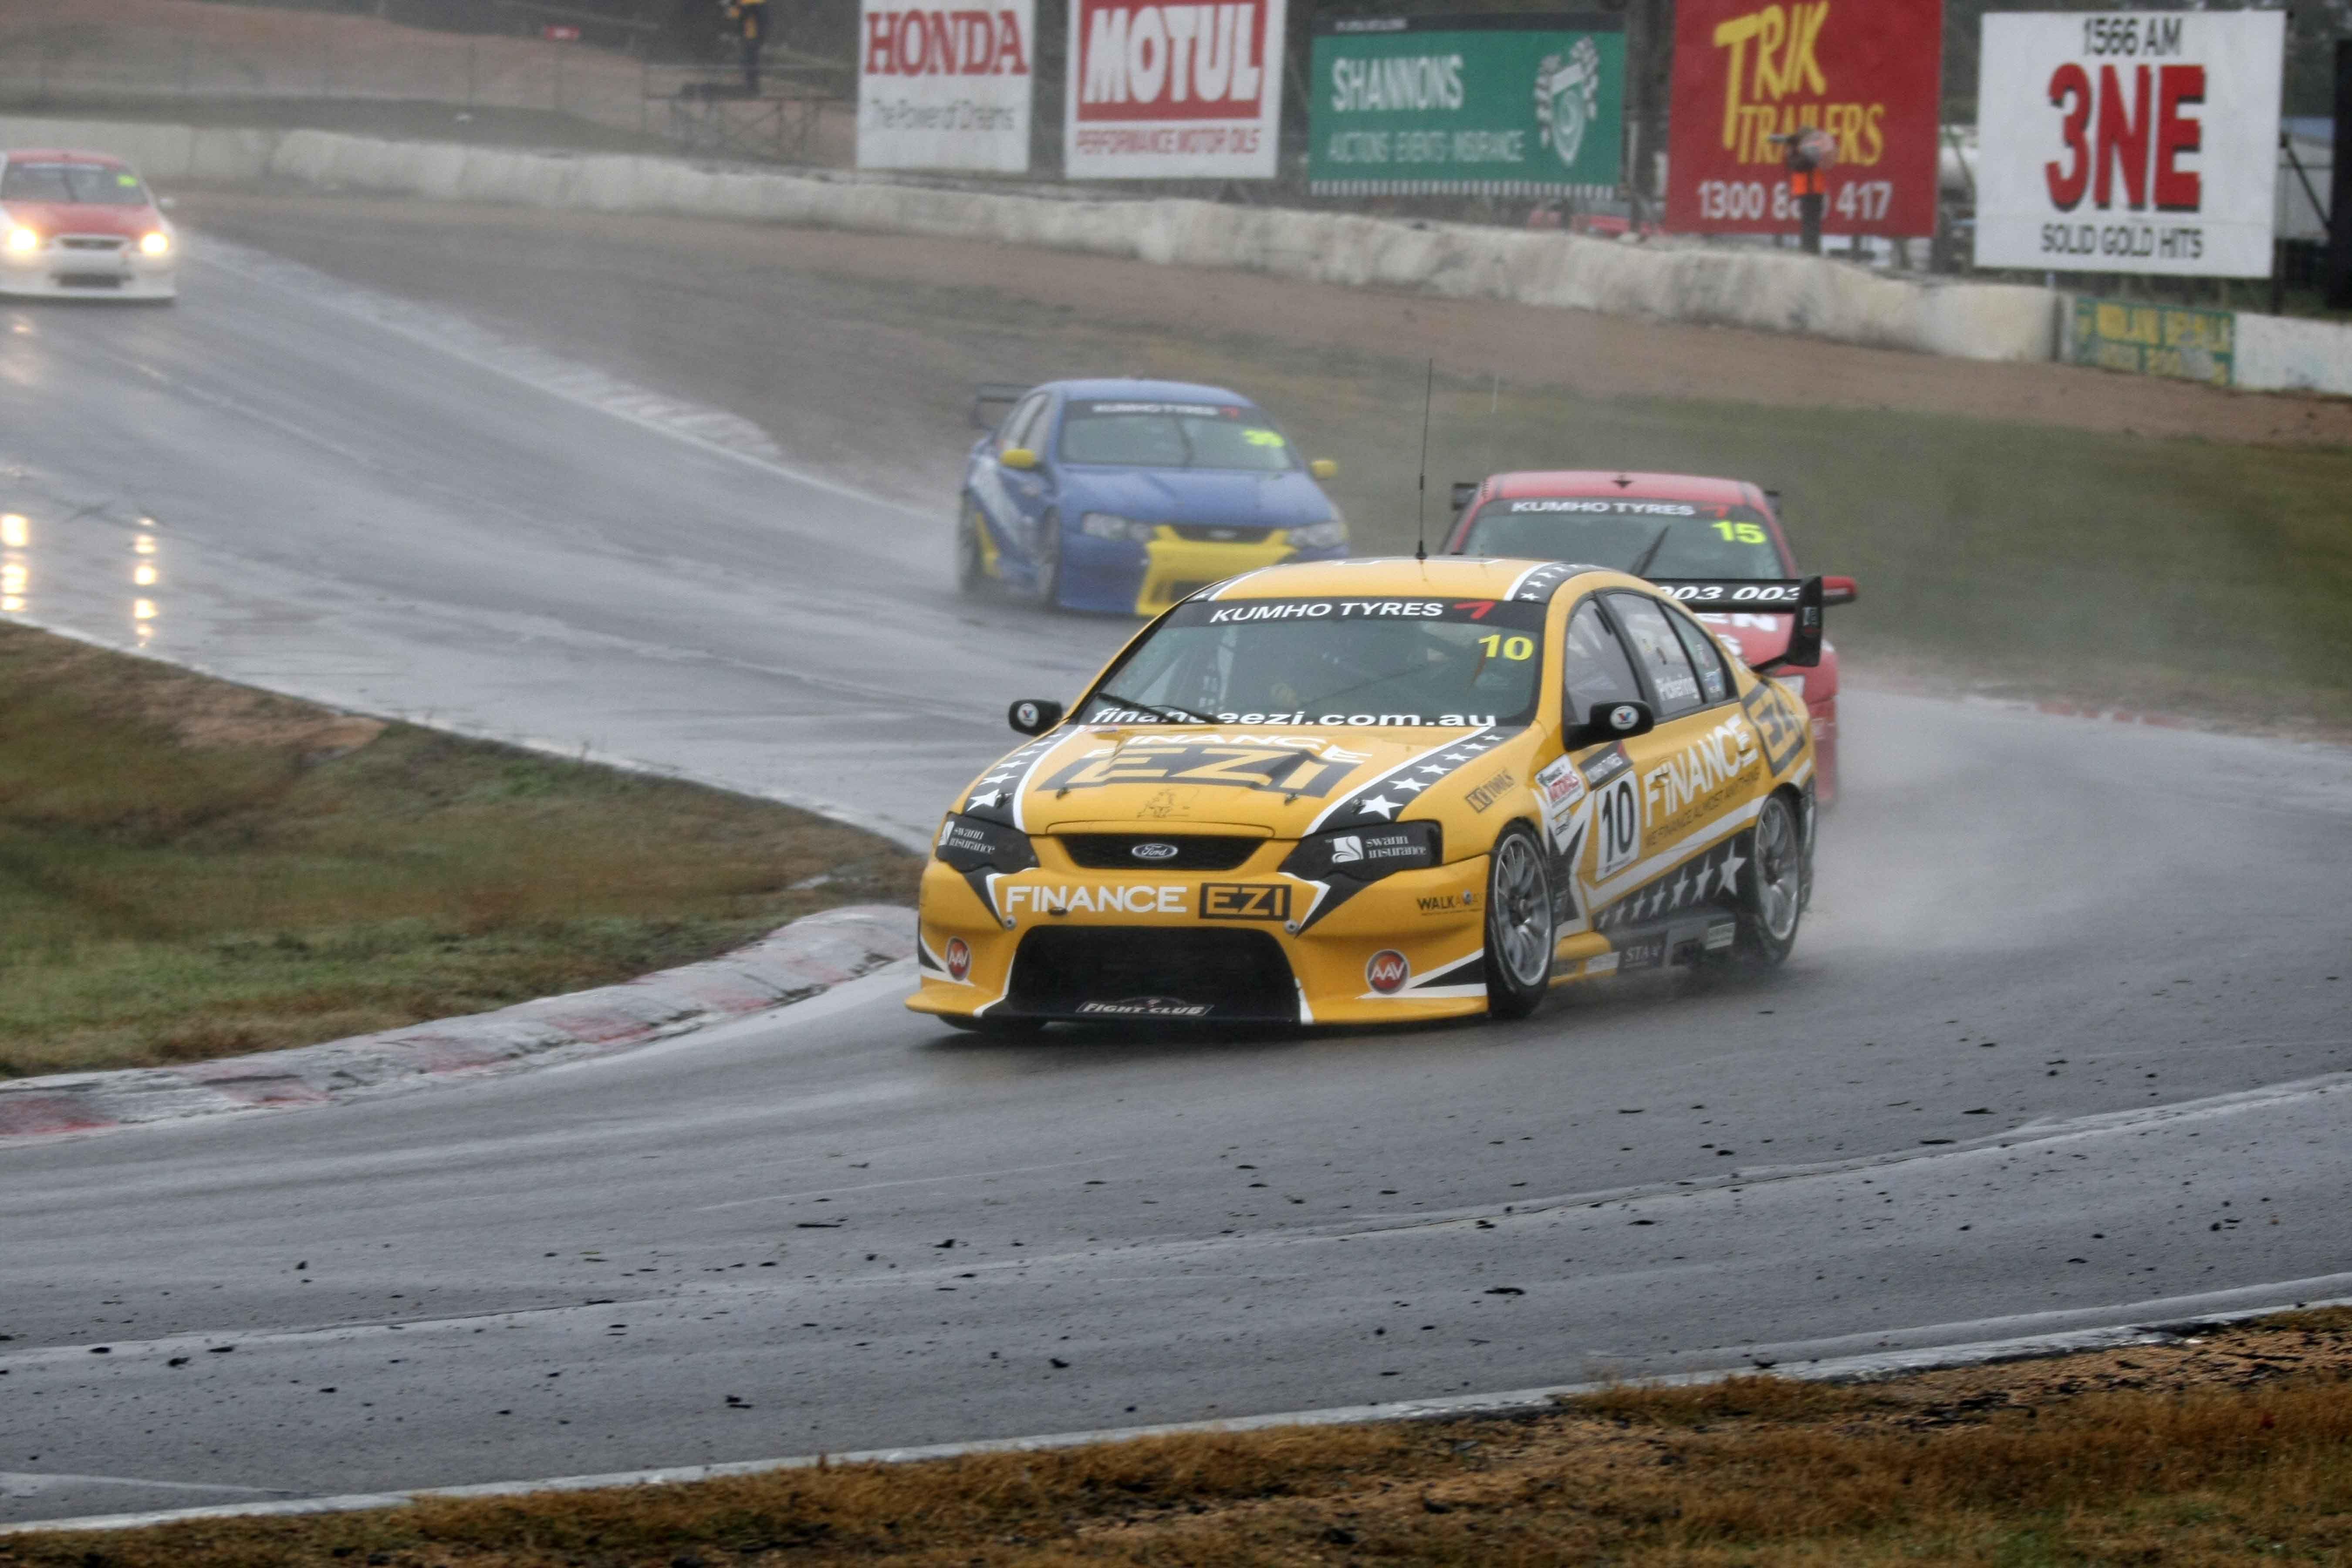 Rough Racing V8 Kumhotyres Racecar Race Cars Racing Super Cars